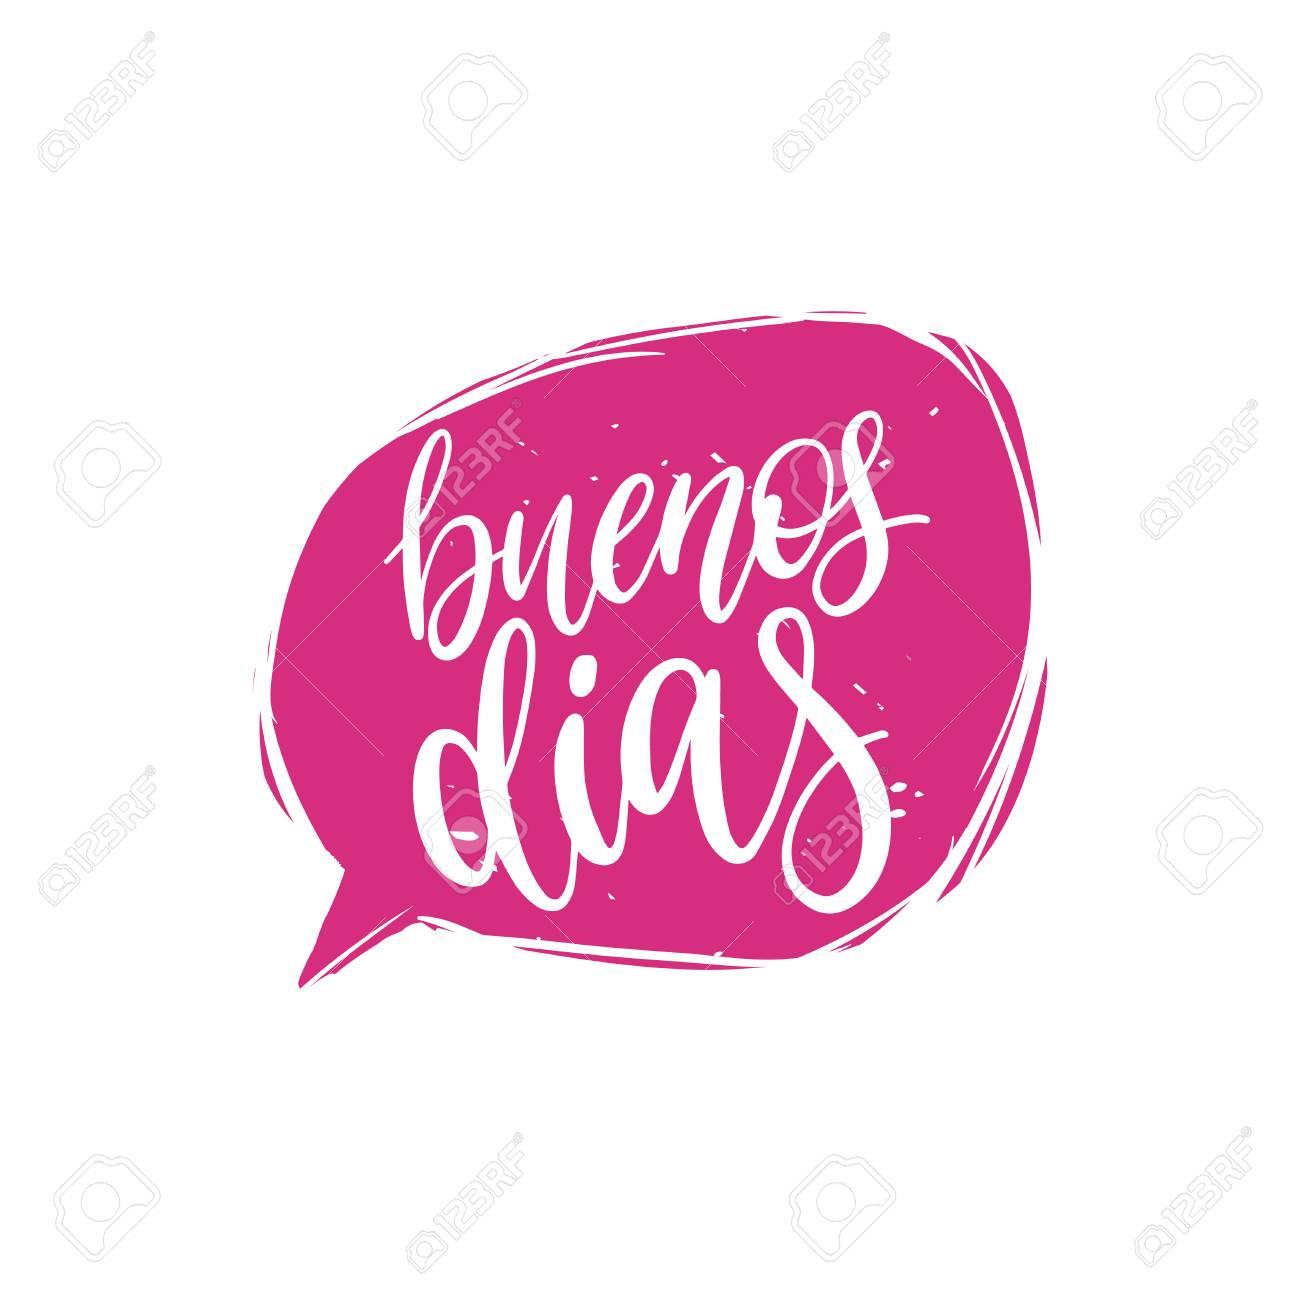 Vector Buenos Dias calligraphy, spanish translation of Good Morning..